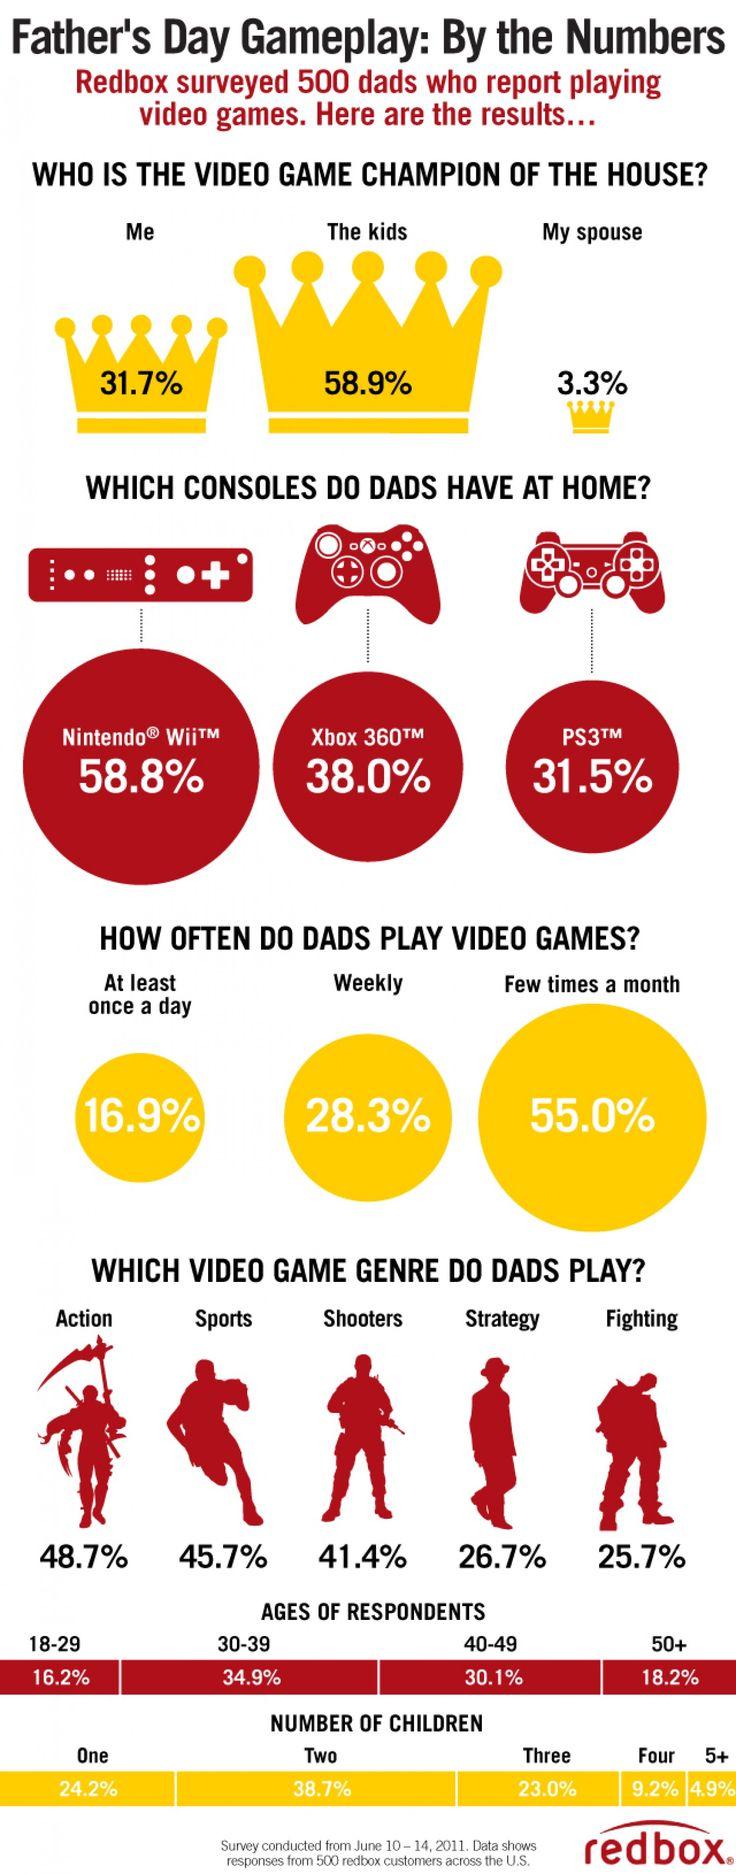 using infographics to analyze categorical data